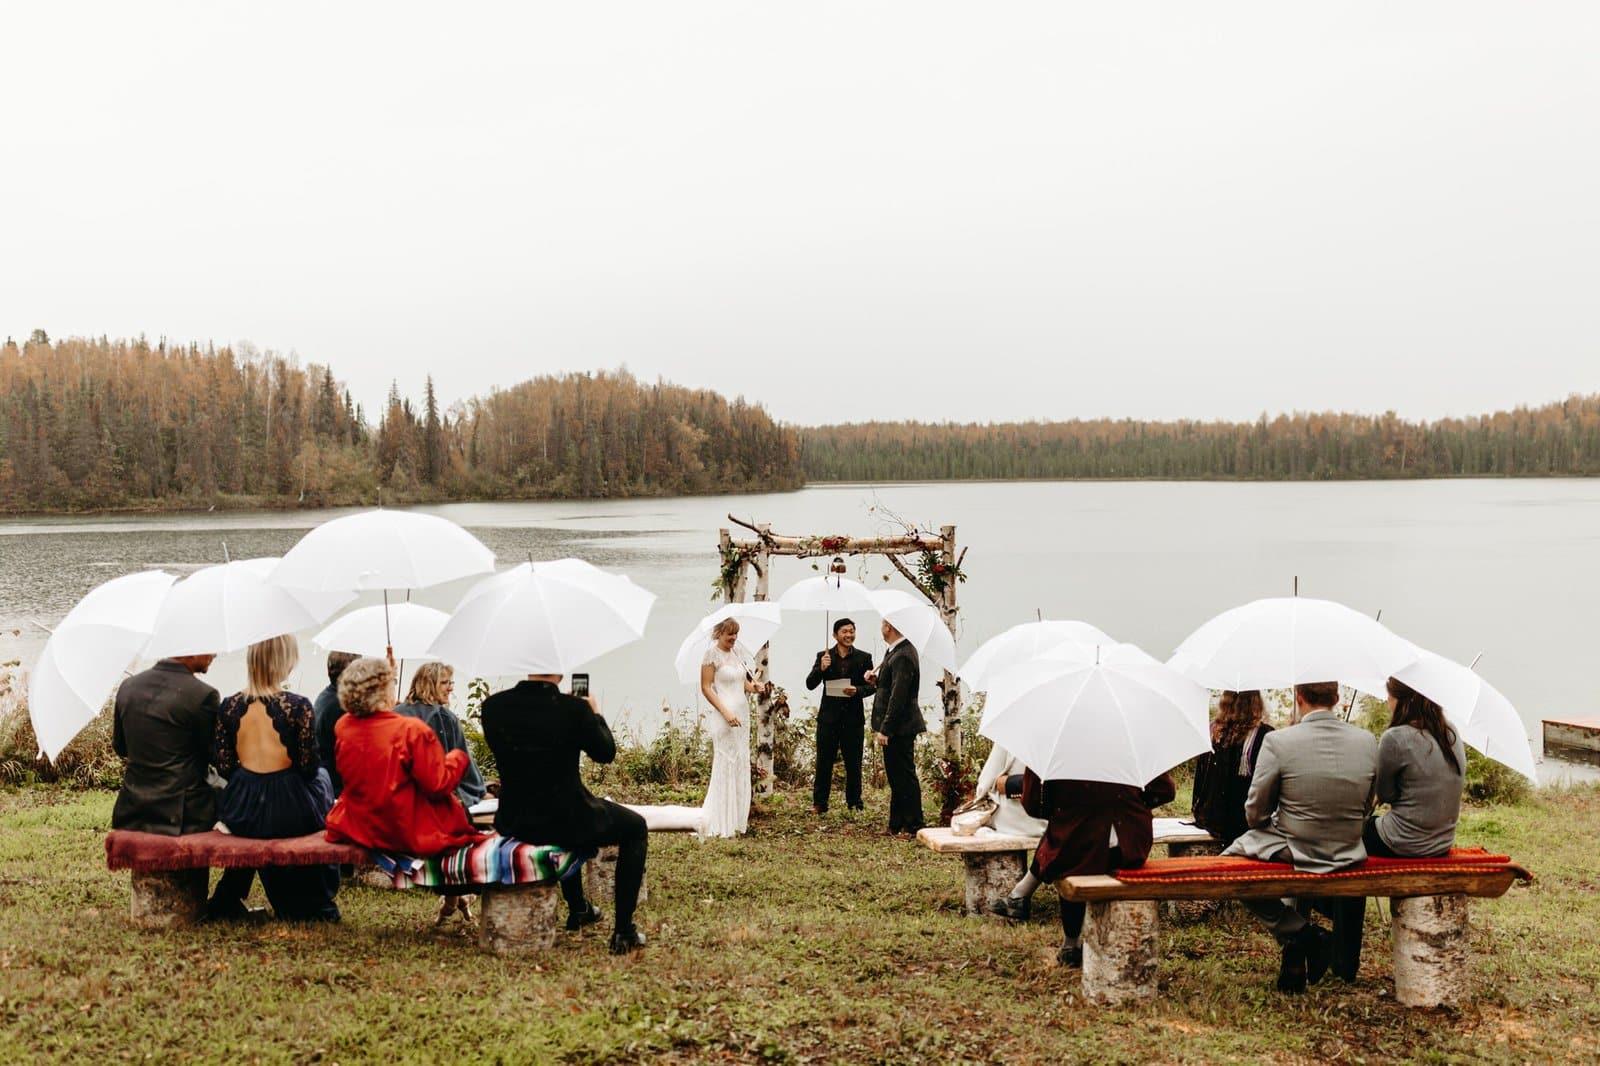 elopement ceremony photography